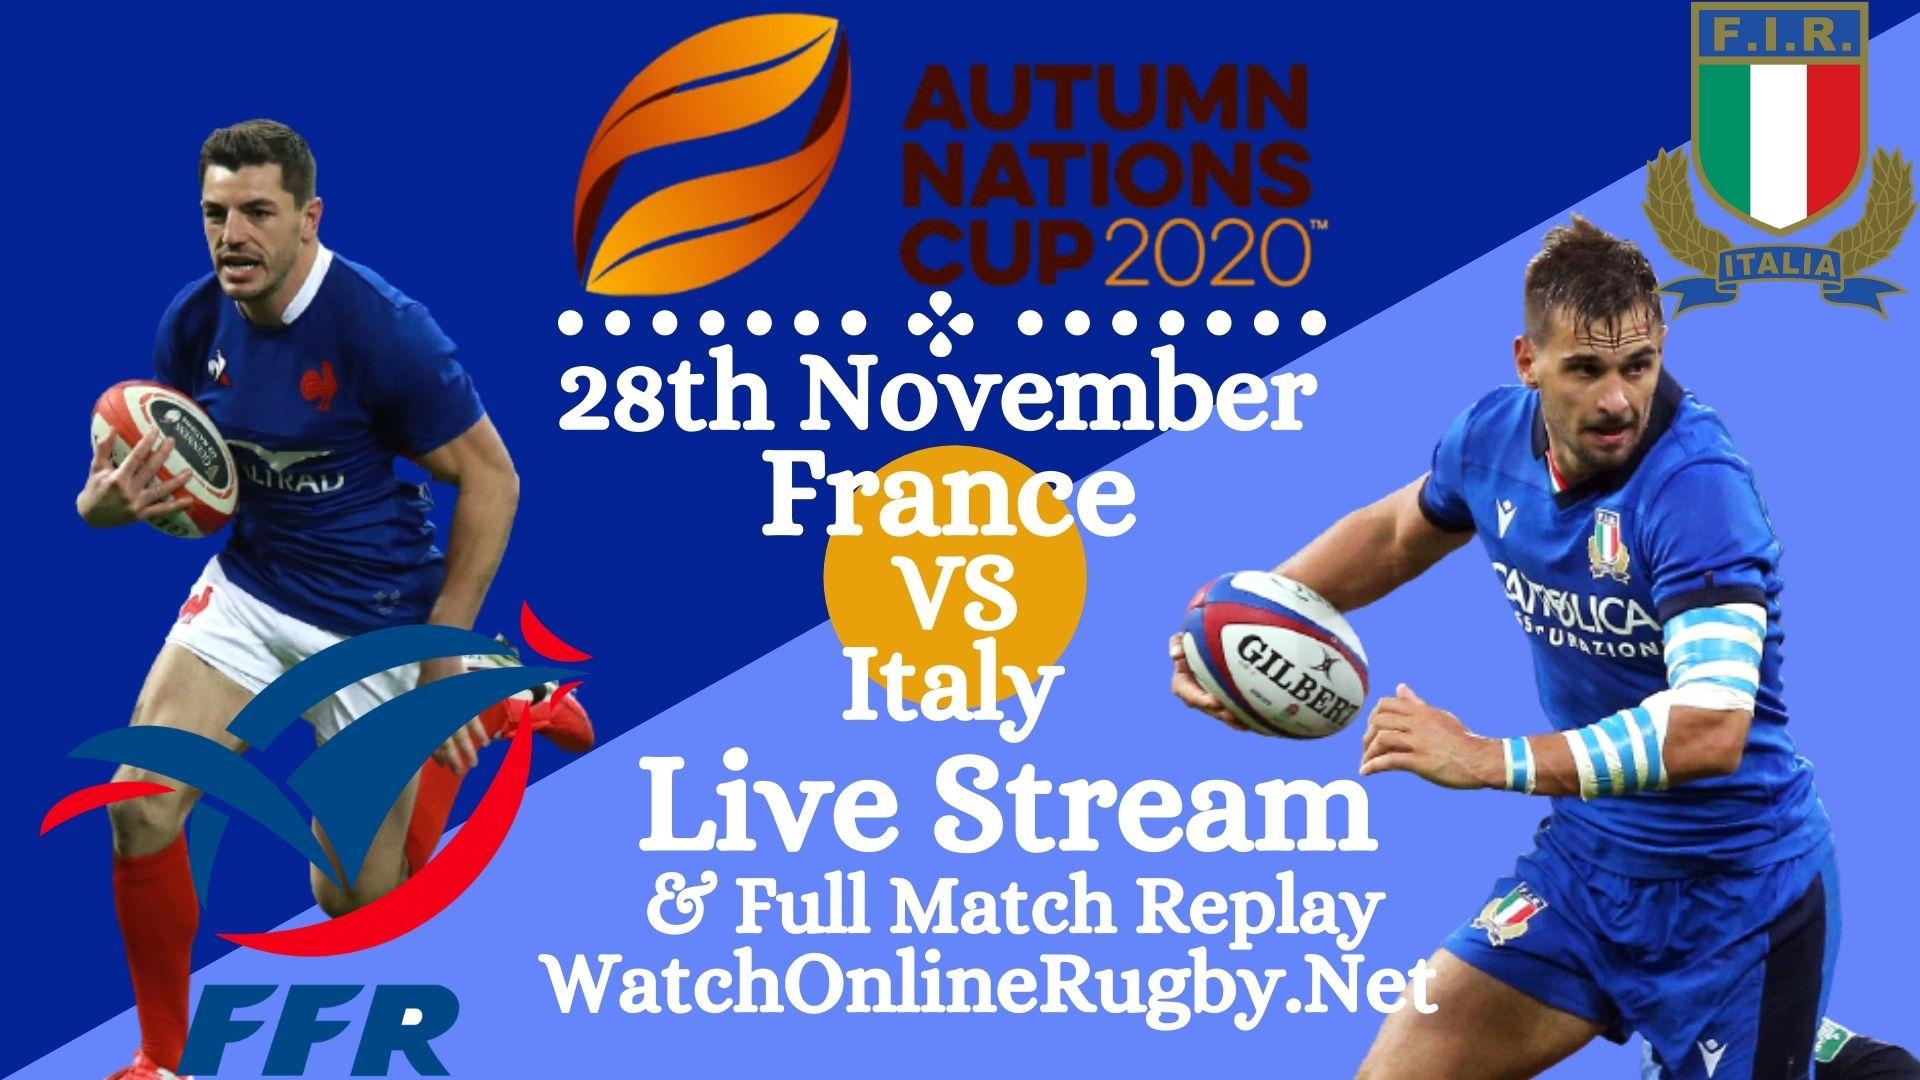 France VS Italy Live Stream Match Full Replay